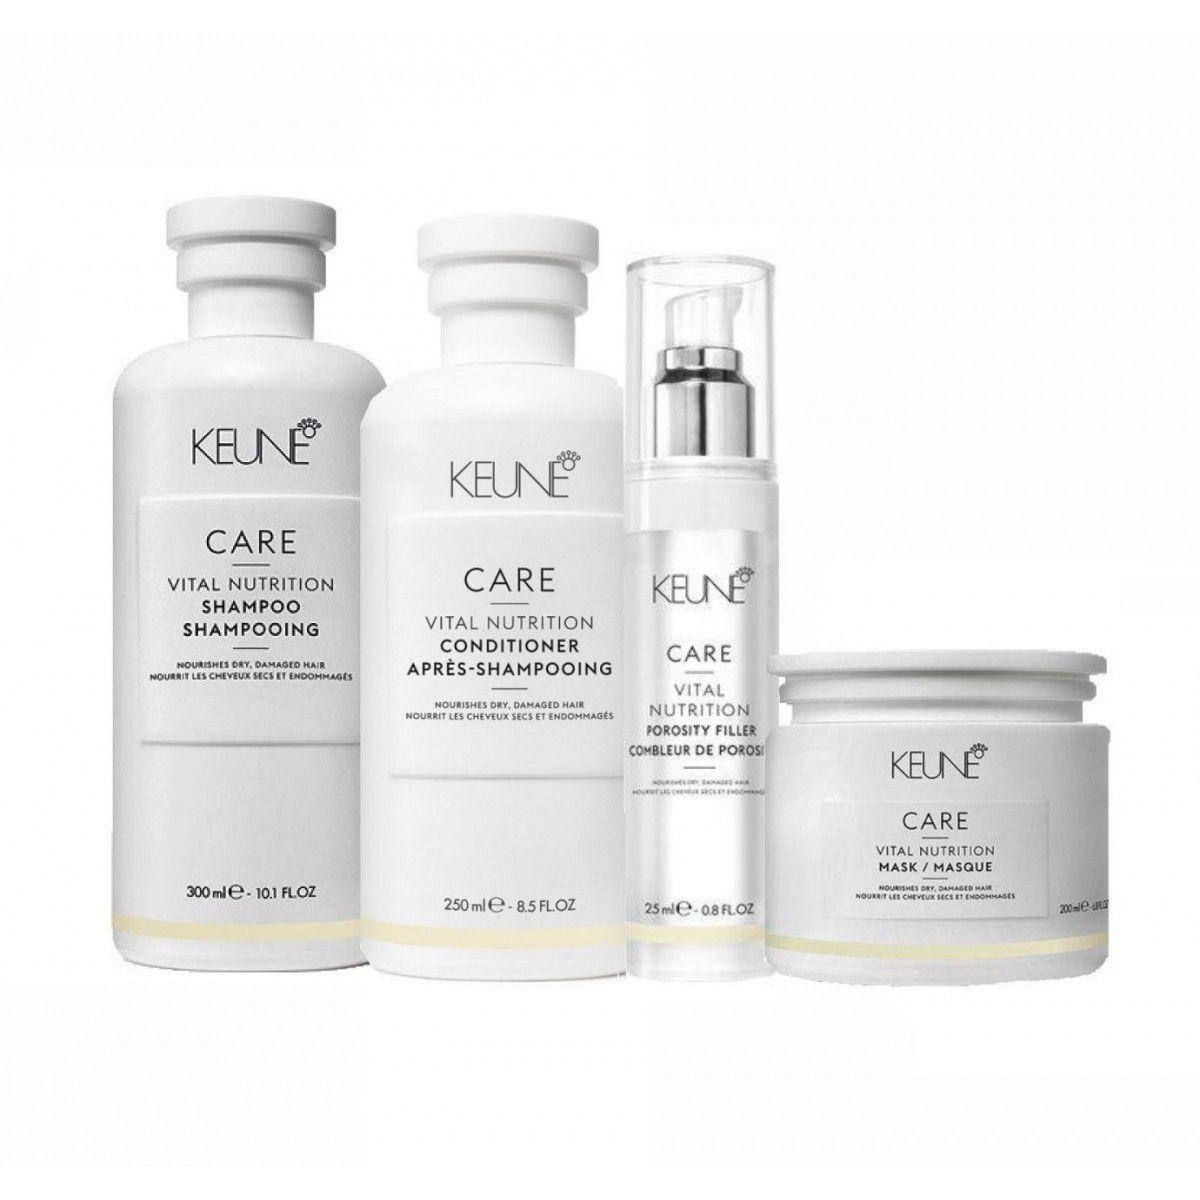 Kit Keune Vital Nutrition